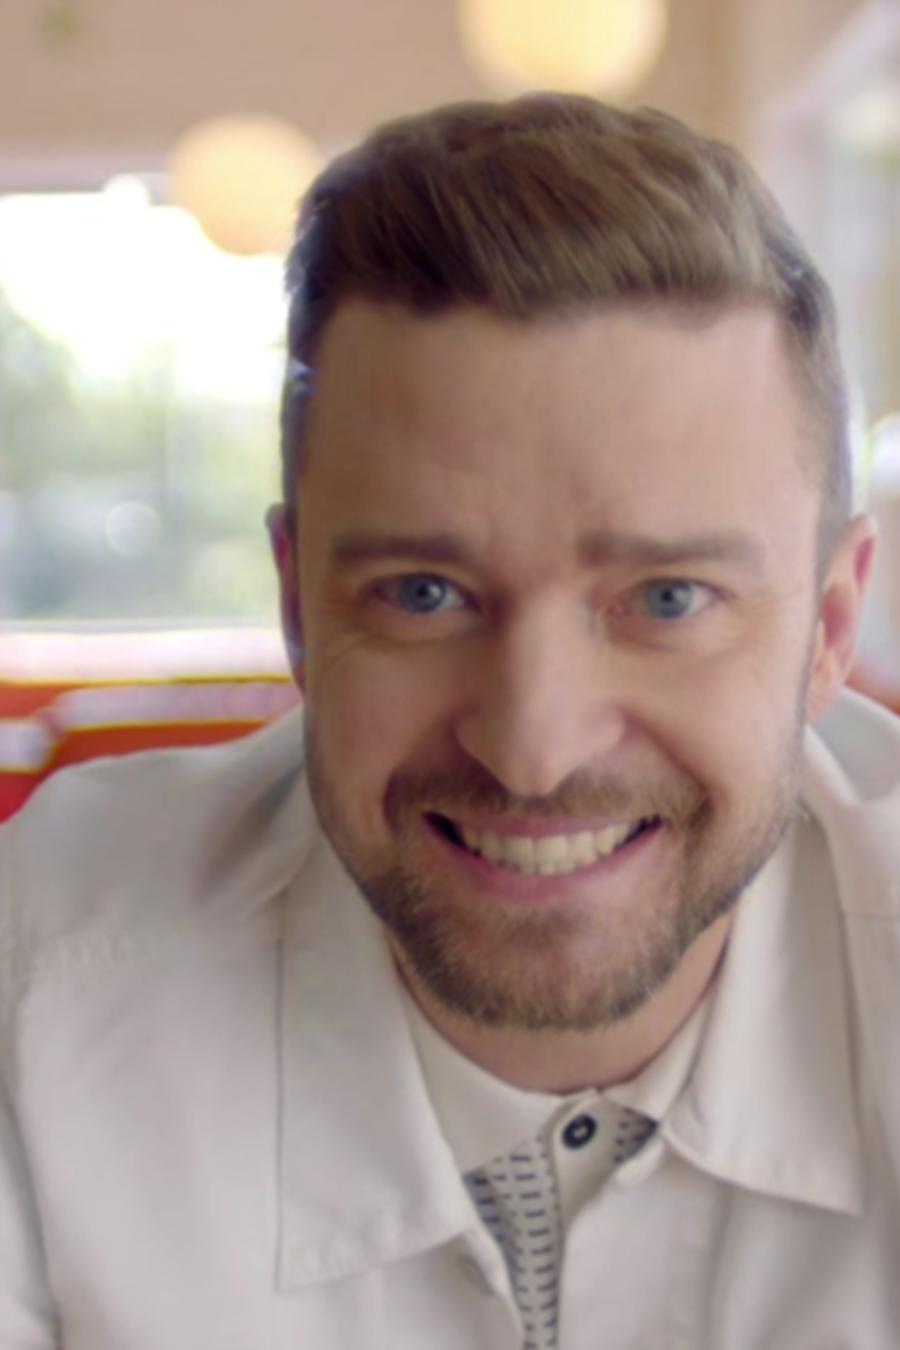 Justin Timberlake en el video musical Can't stop the feeling